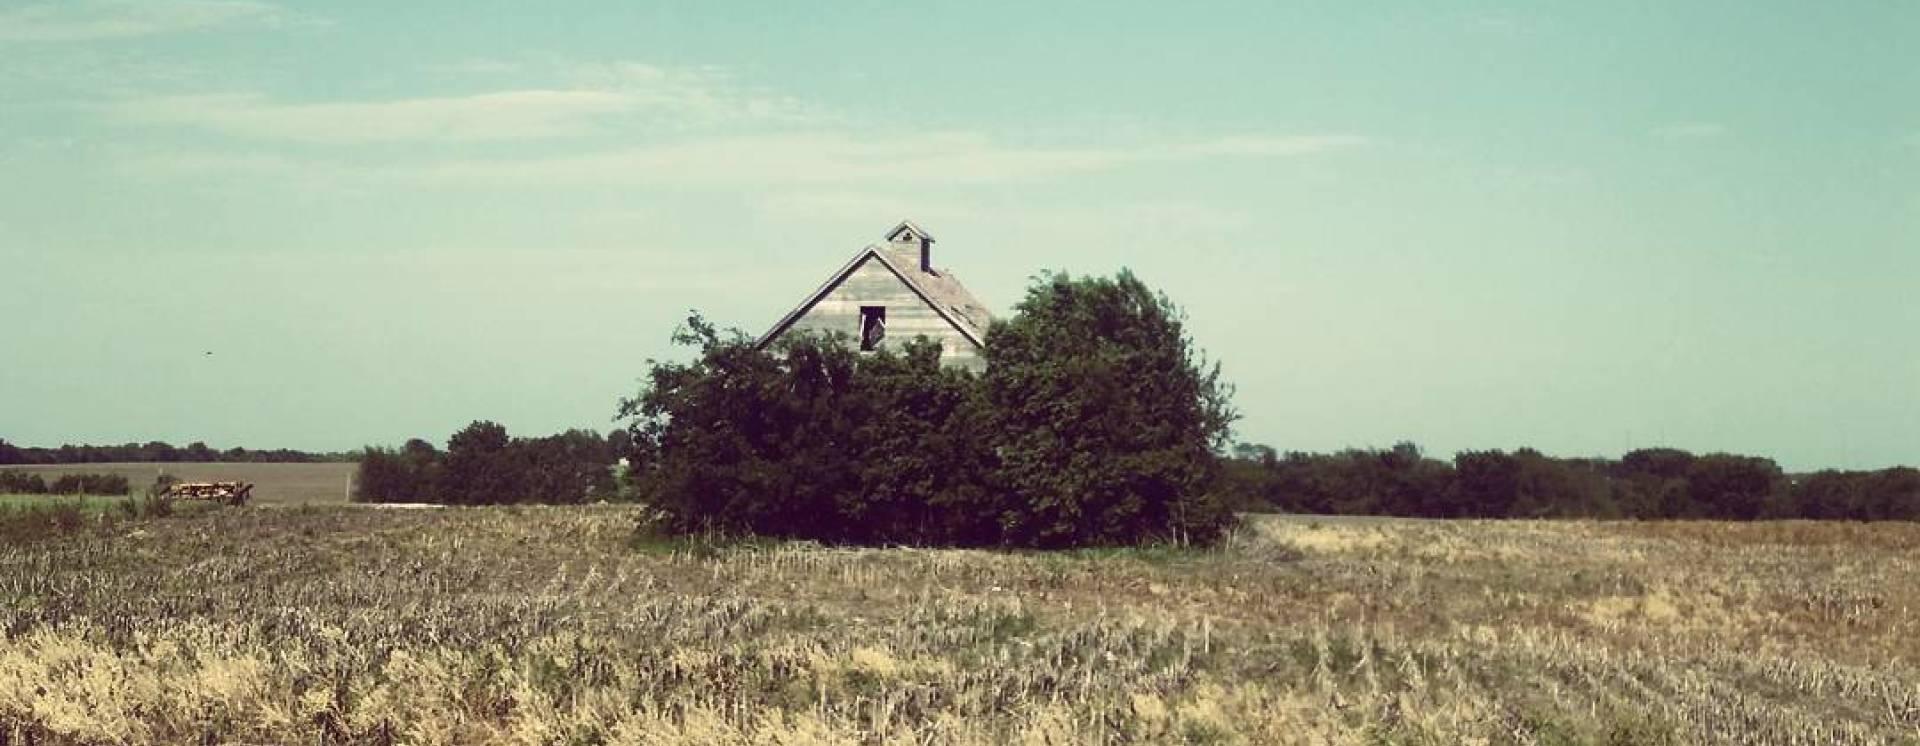 Farmhouse copy